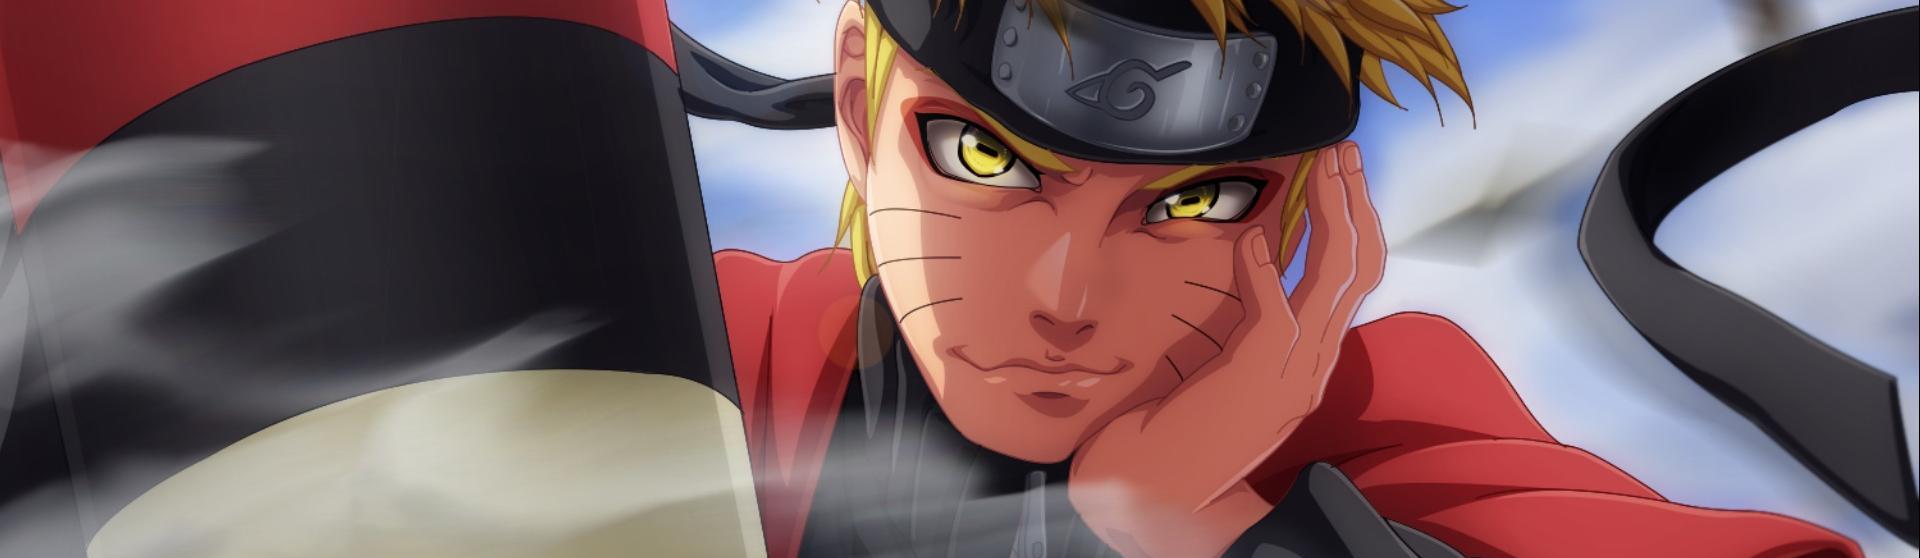 Wallpaper Manga Naruto